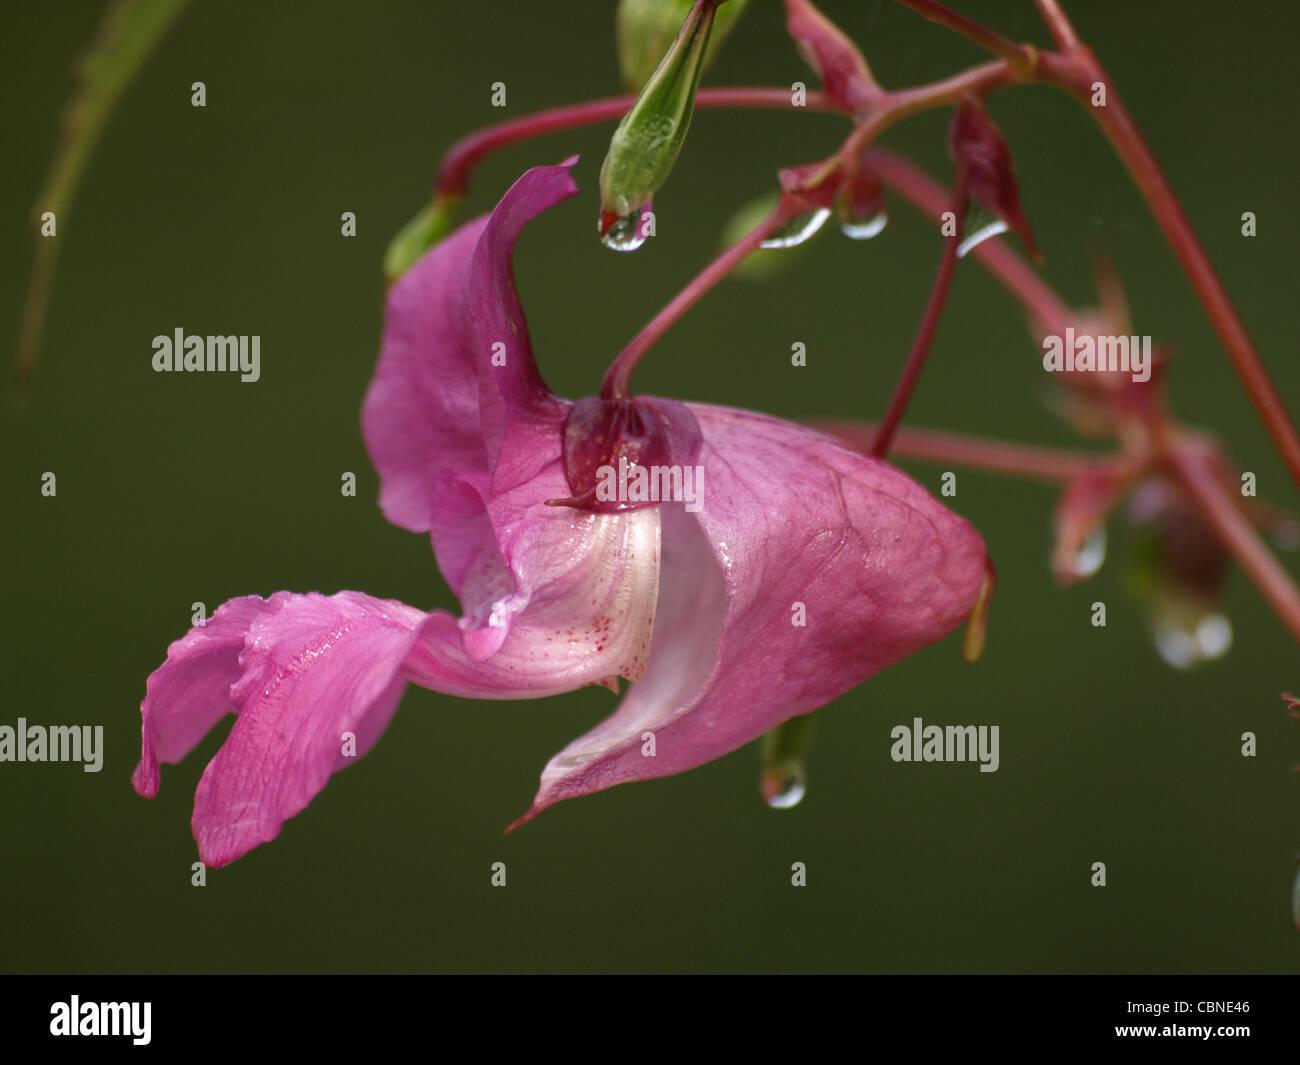 bloom Policeman´s Helmet, Bobby Tops, Himalayan Balsam with drops / Impatiens glandulifera / Drüsiges Springkraut mit Tropfen Stock Photo